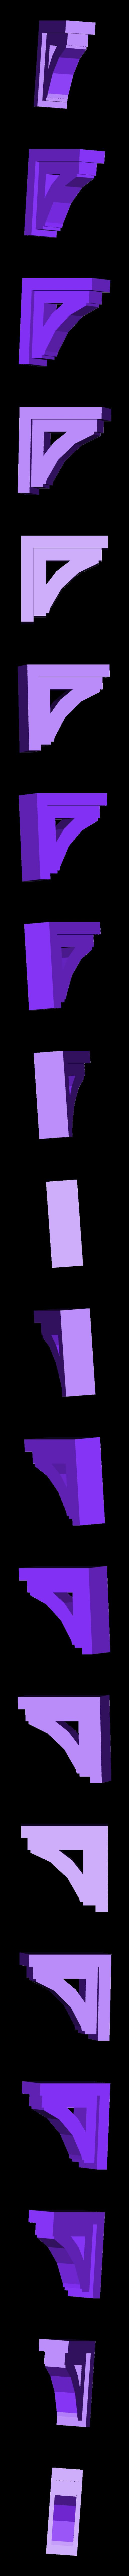 7x7x2_moulding.stl Download free STL file Parametric Corbel • 3D printable model, Steedrick